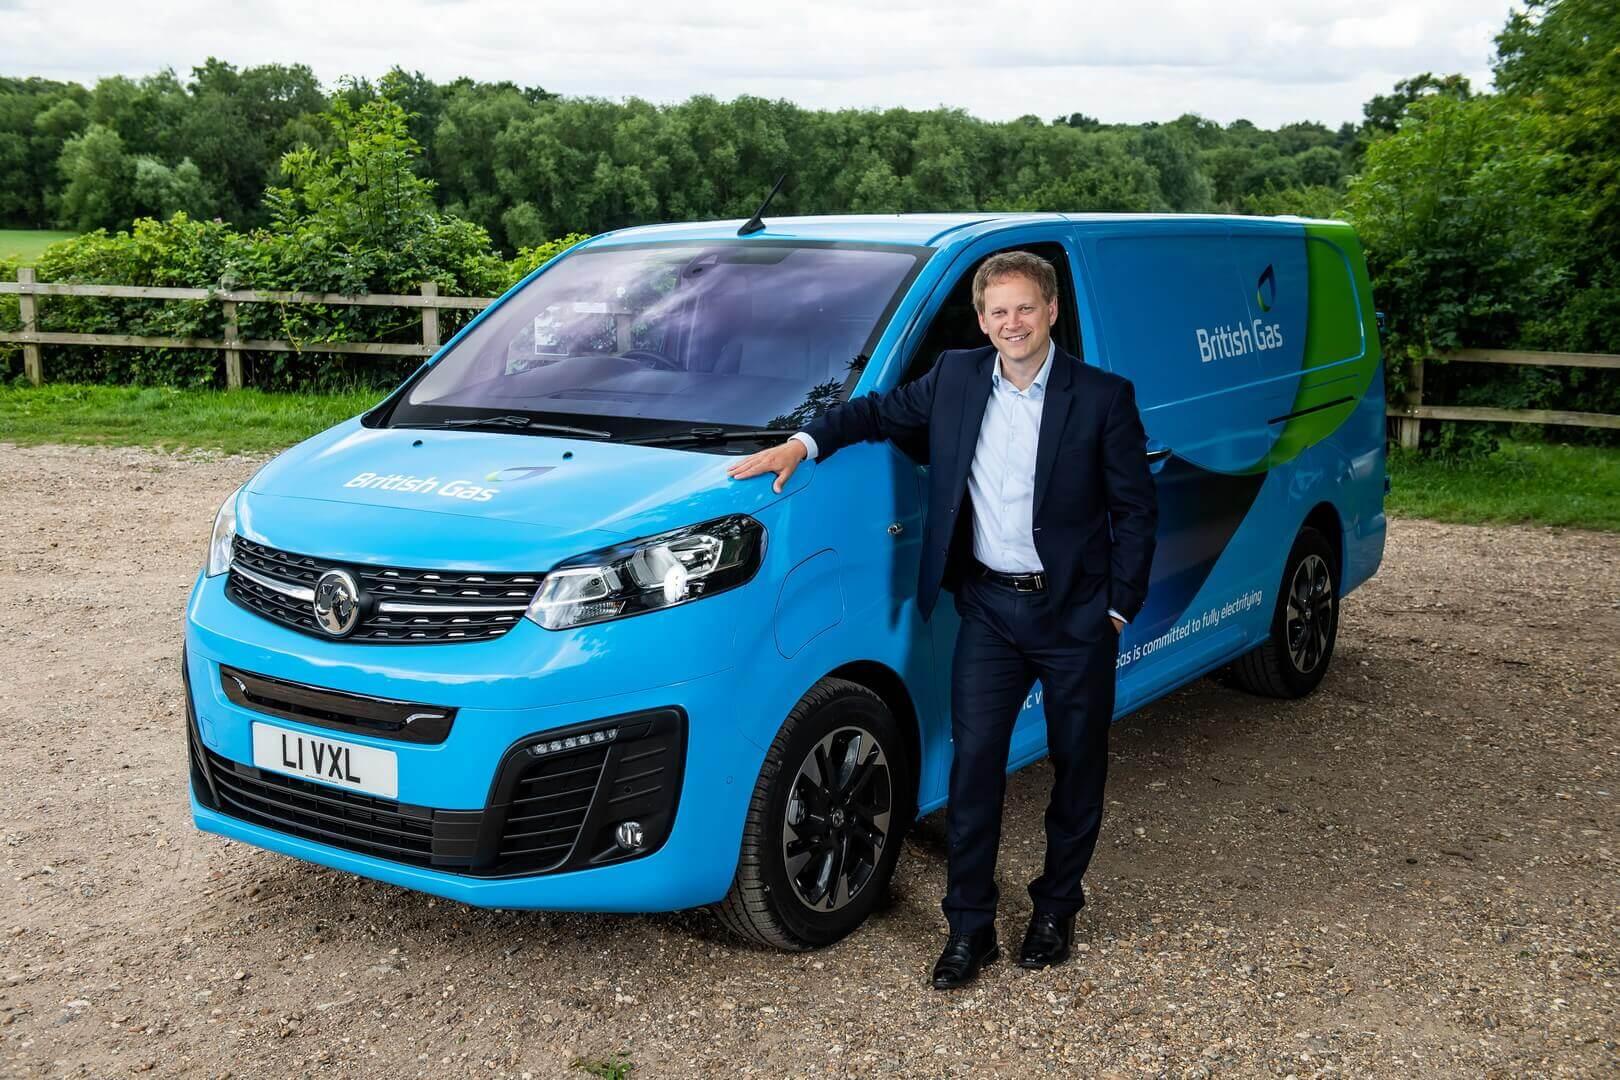 Министр транспорта Великобритании Грант Шэппс вместе с новым электрическим фургоном British Gas